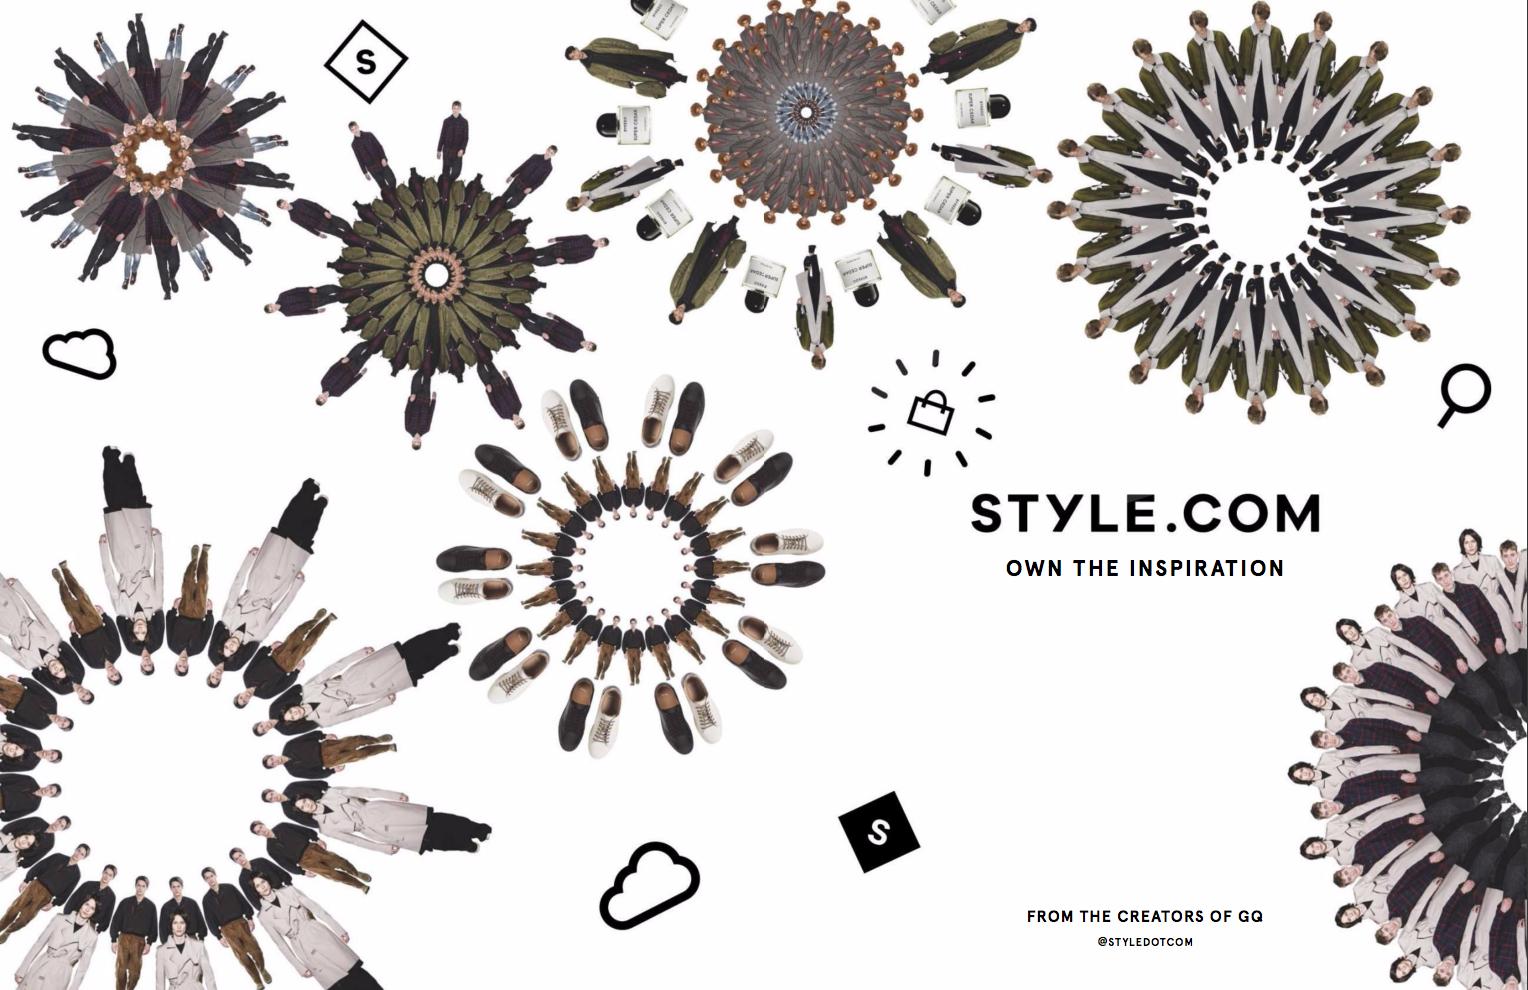 STYLE.COM 2017 advertising